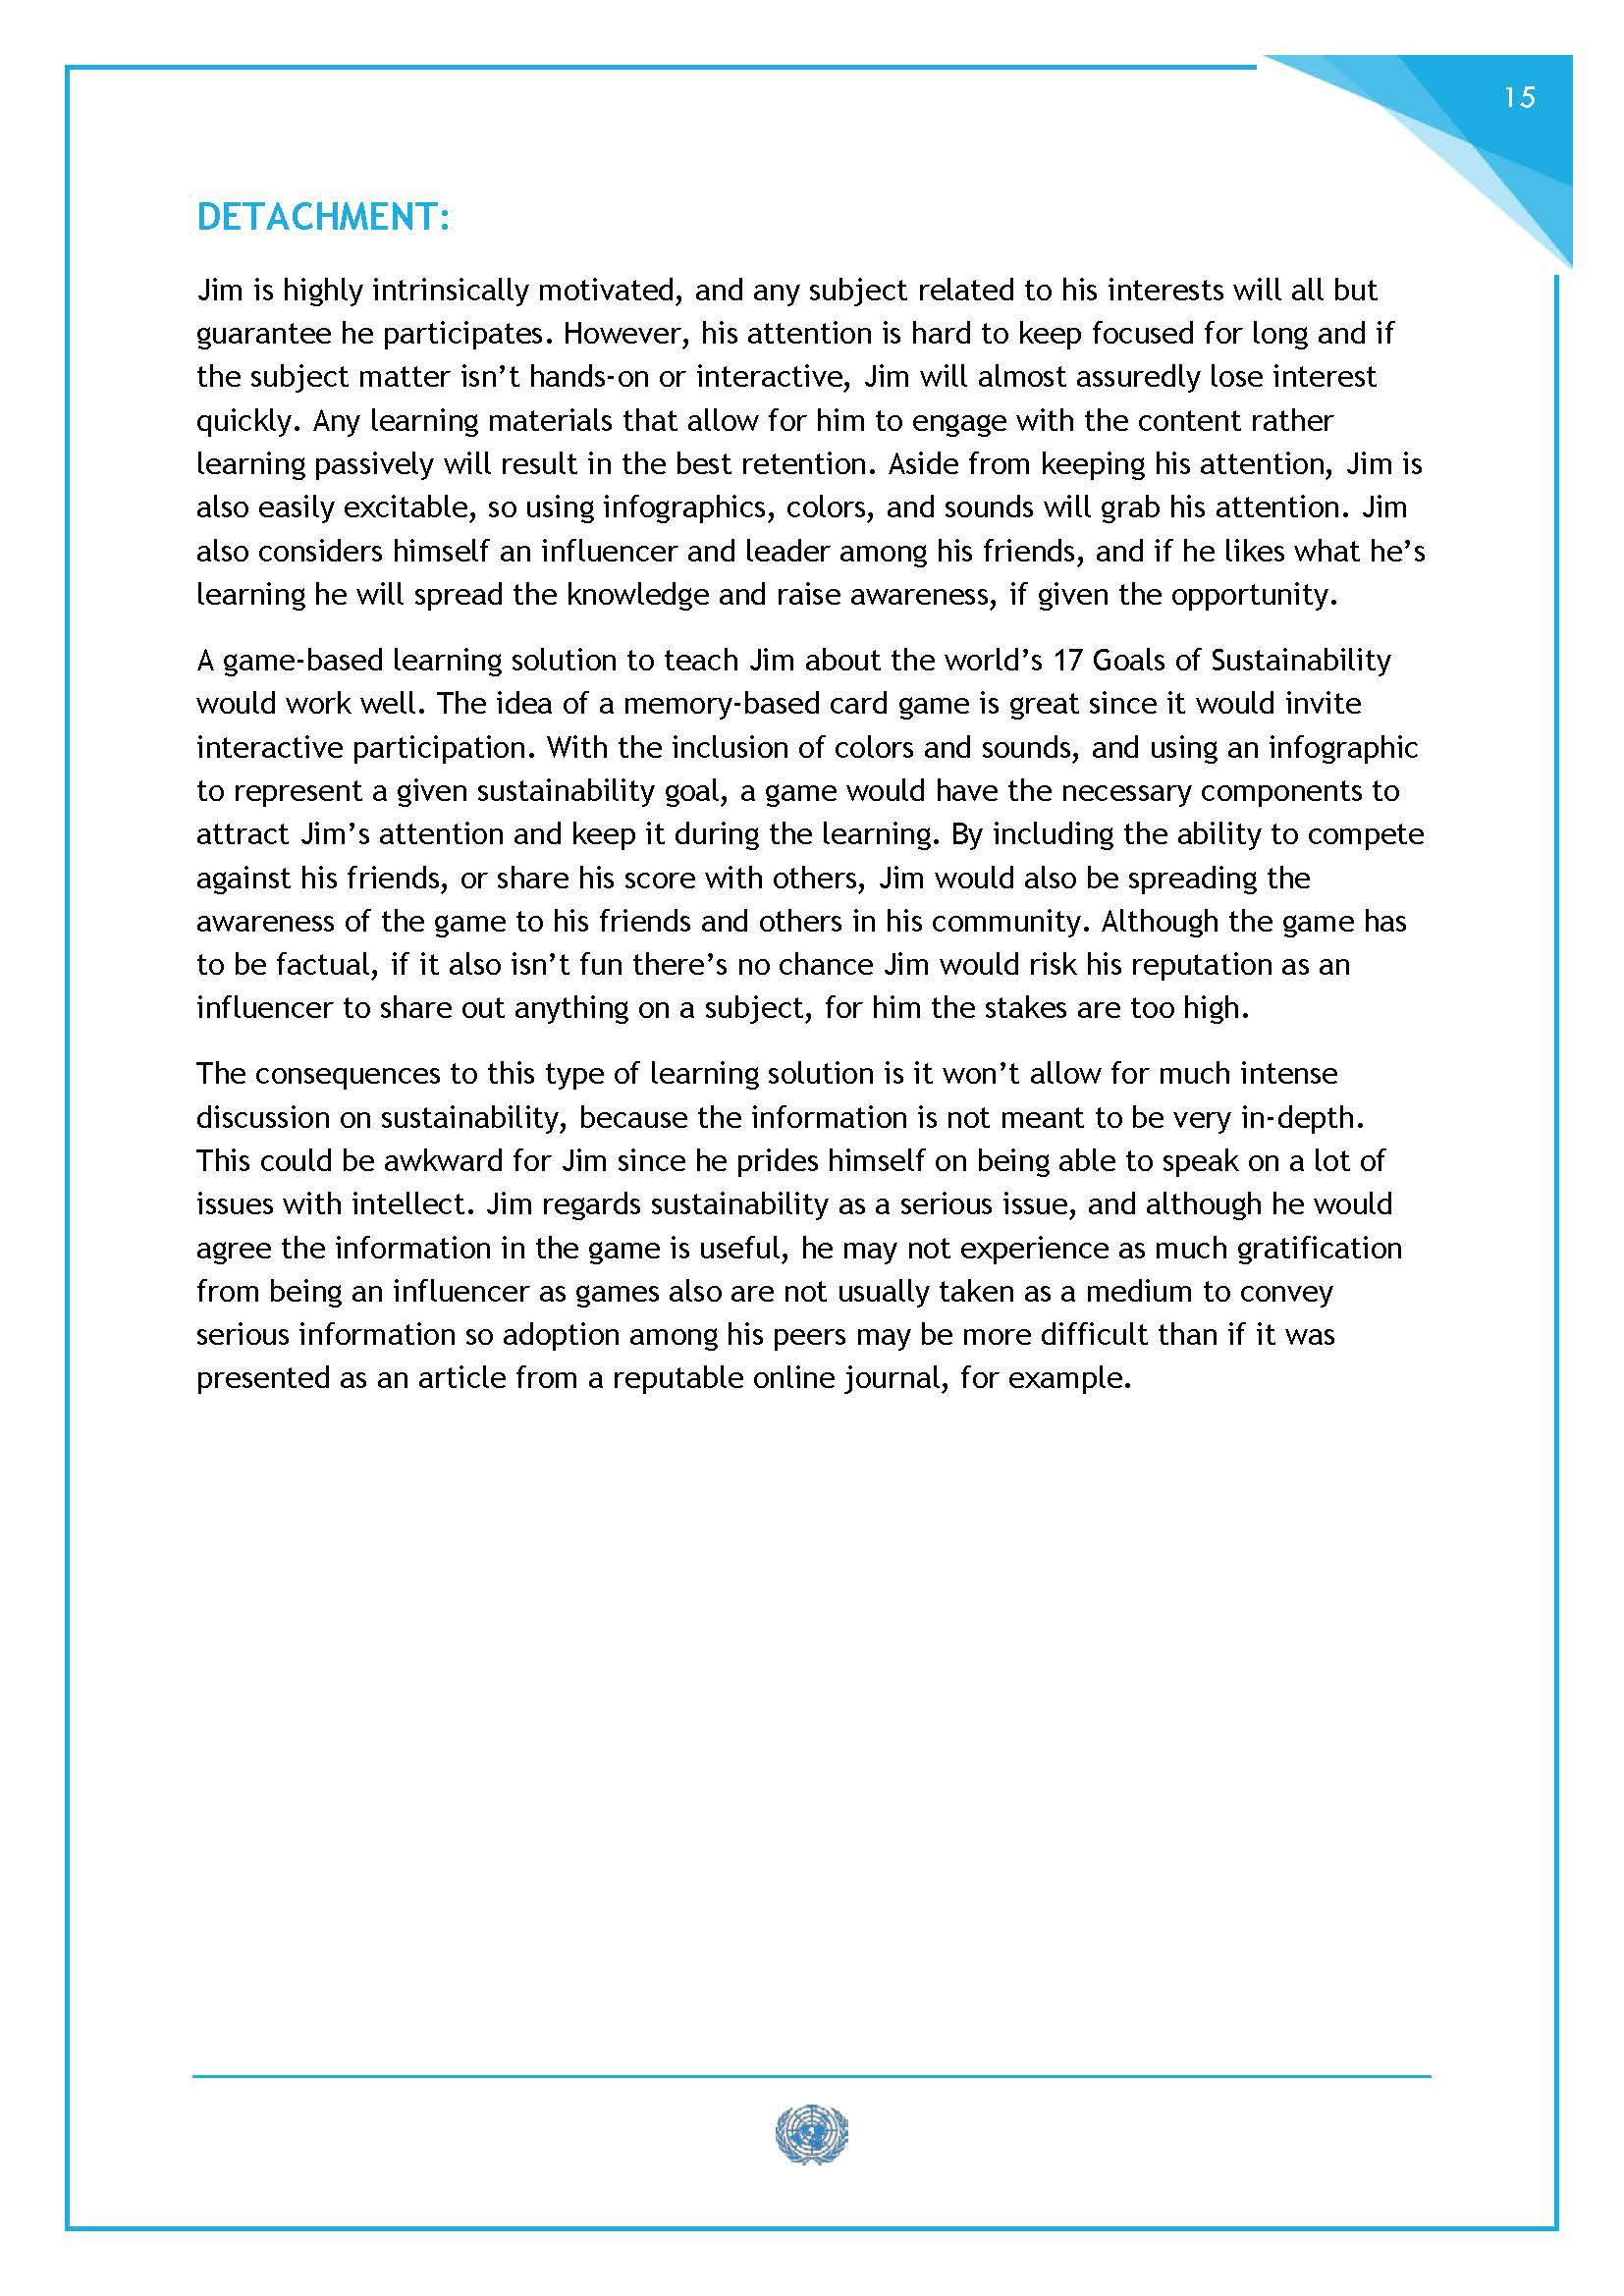 Design Document_Kraus&Beatty_Page_16.jpg